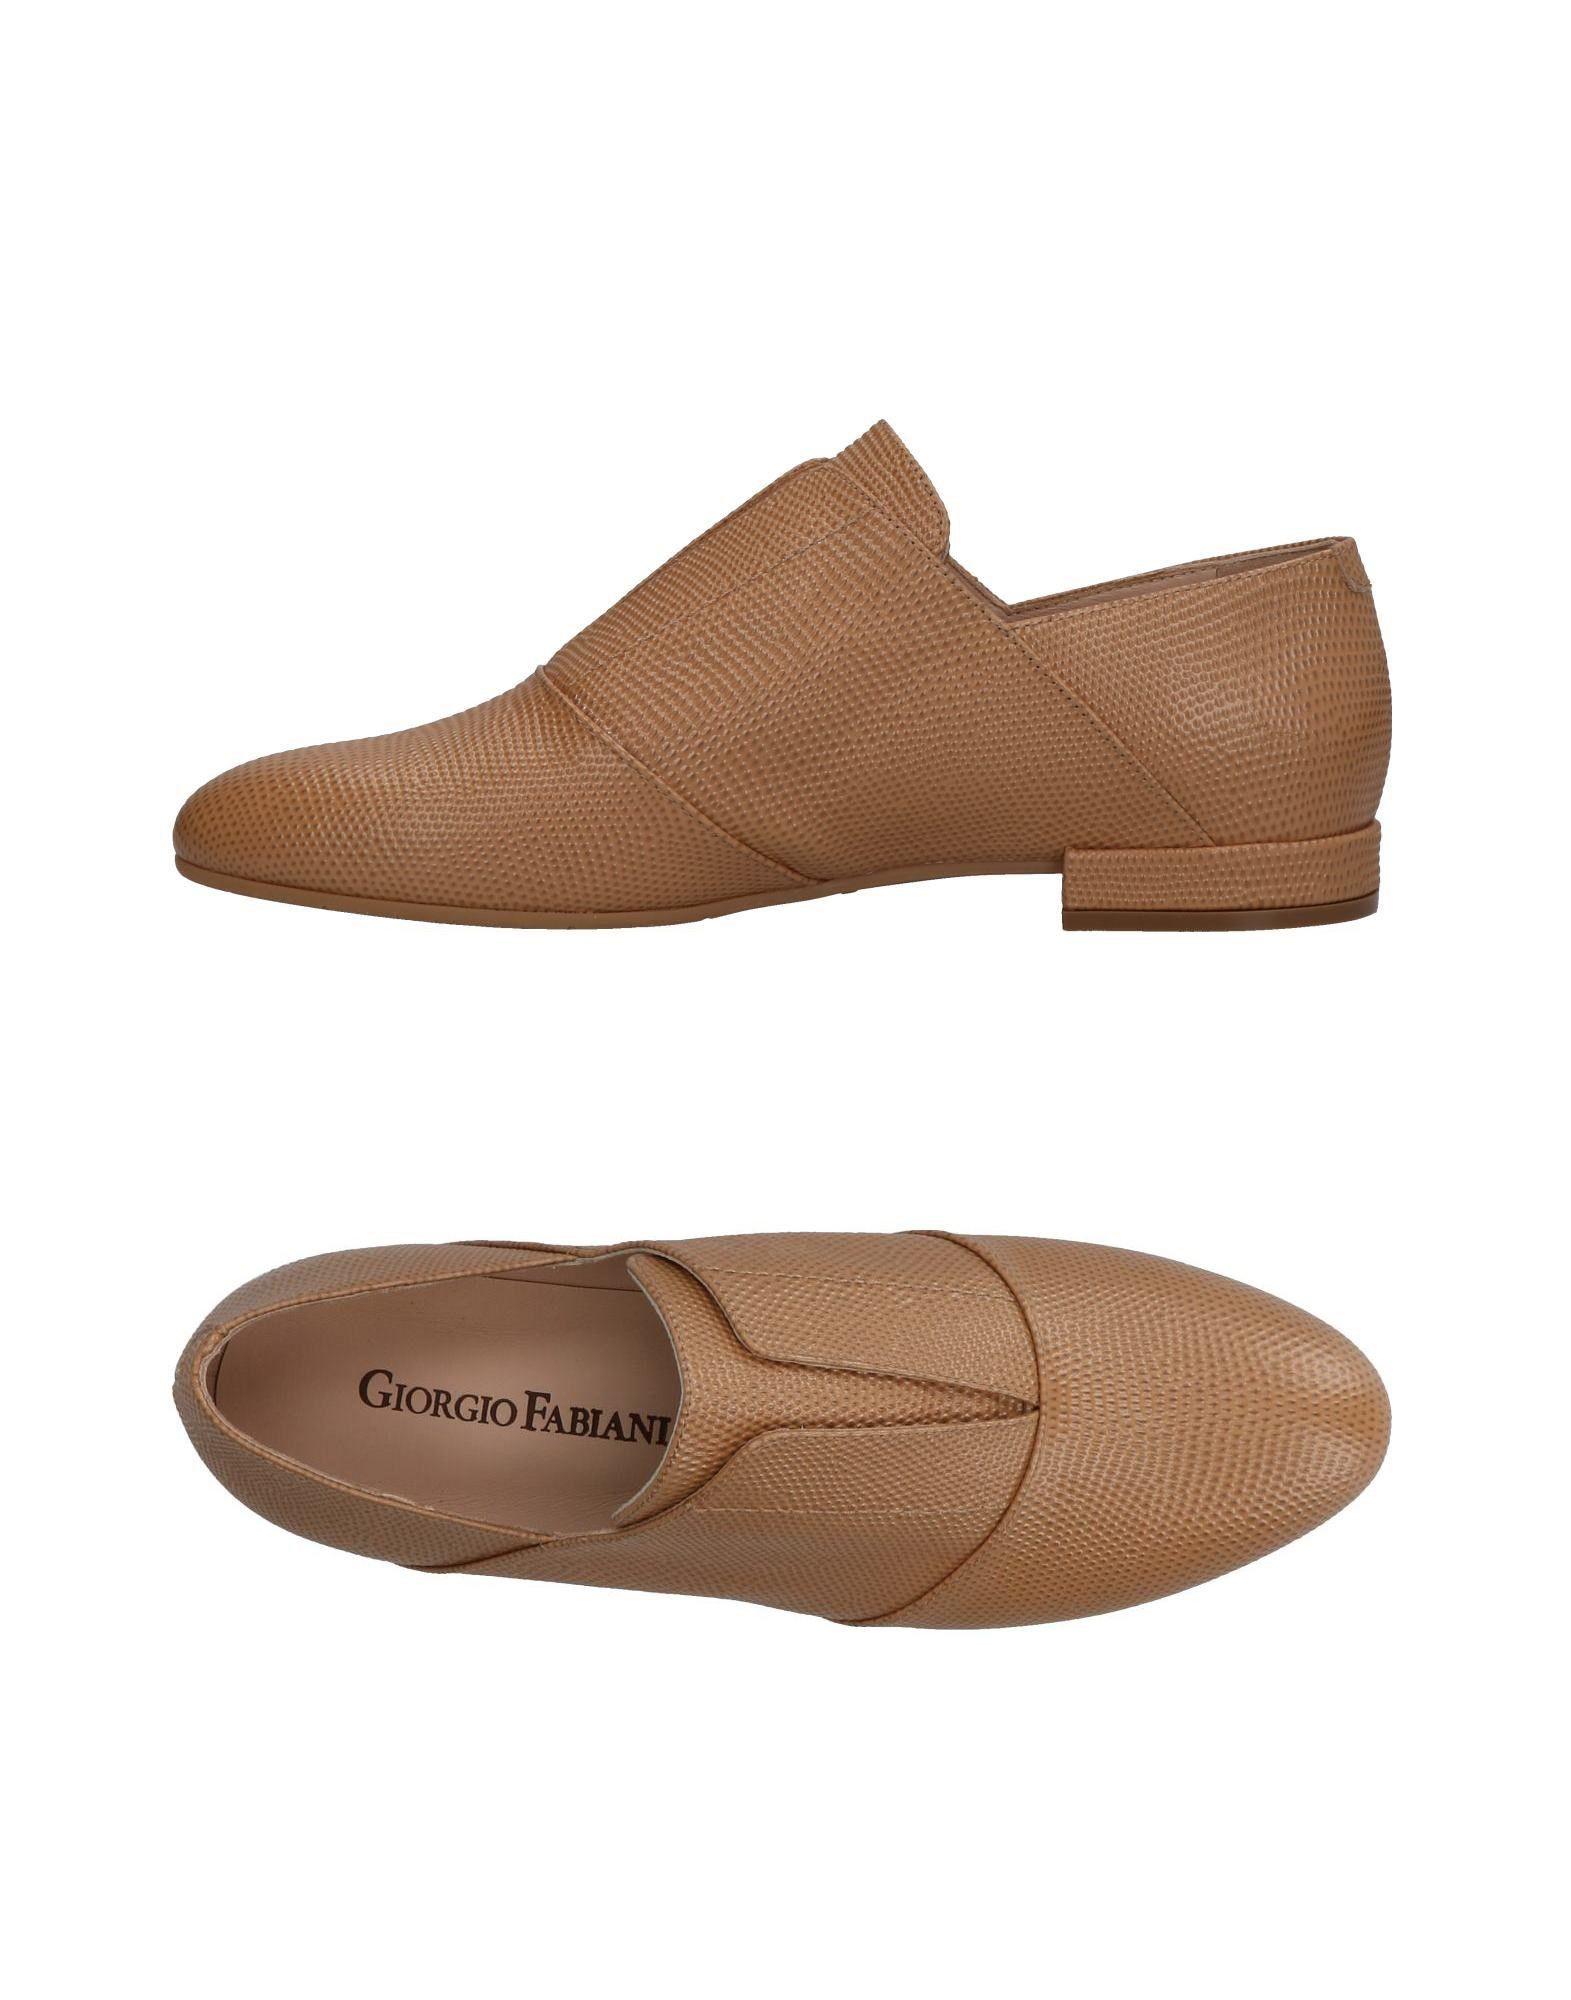 Giorgio Fabiani Mokassins Damen  11332910WW Gute Qualität beliebte Schuhe